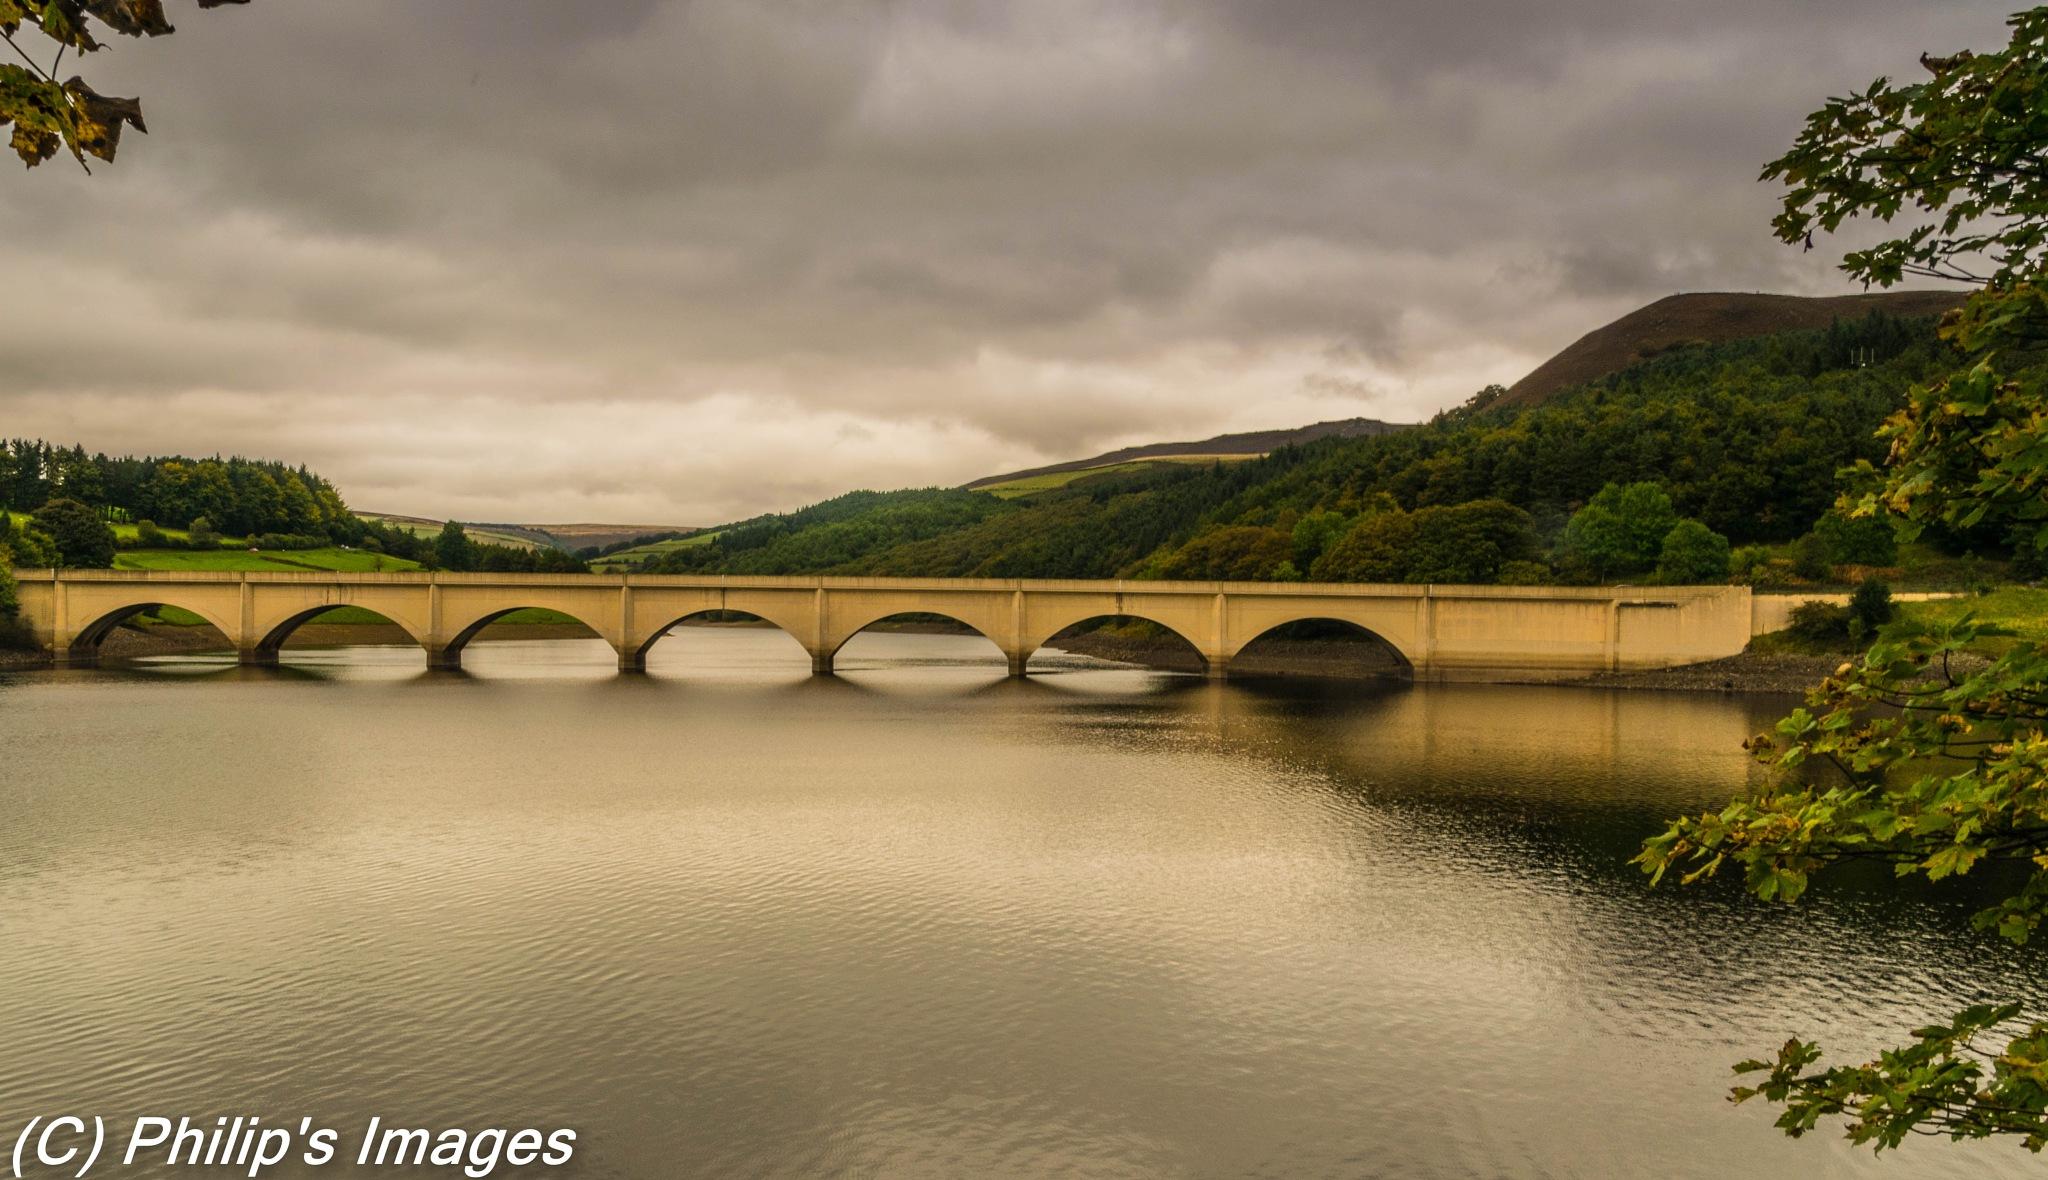 Ashopton Bridge by philips images